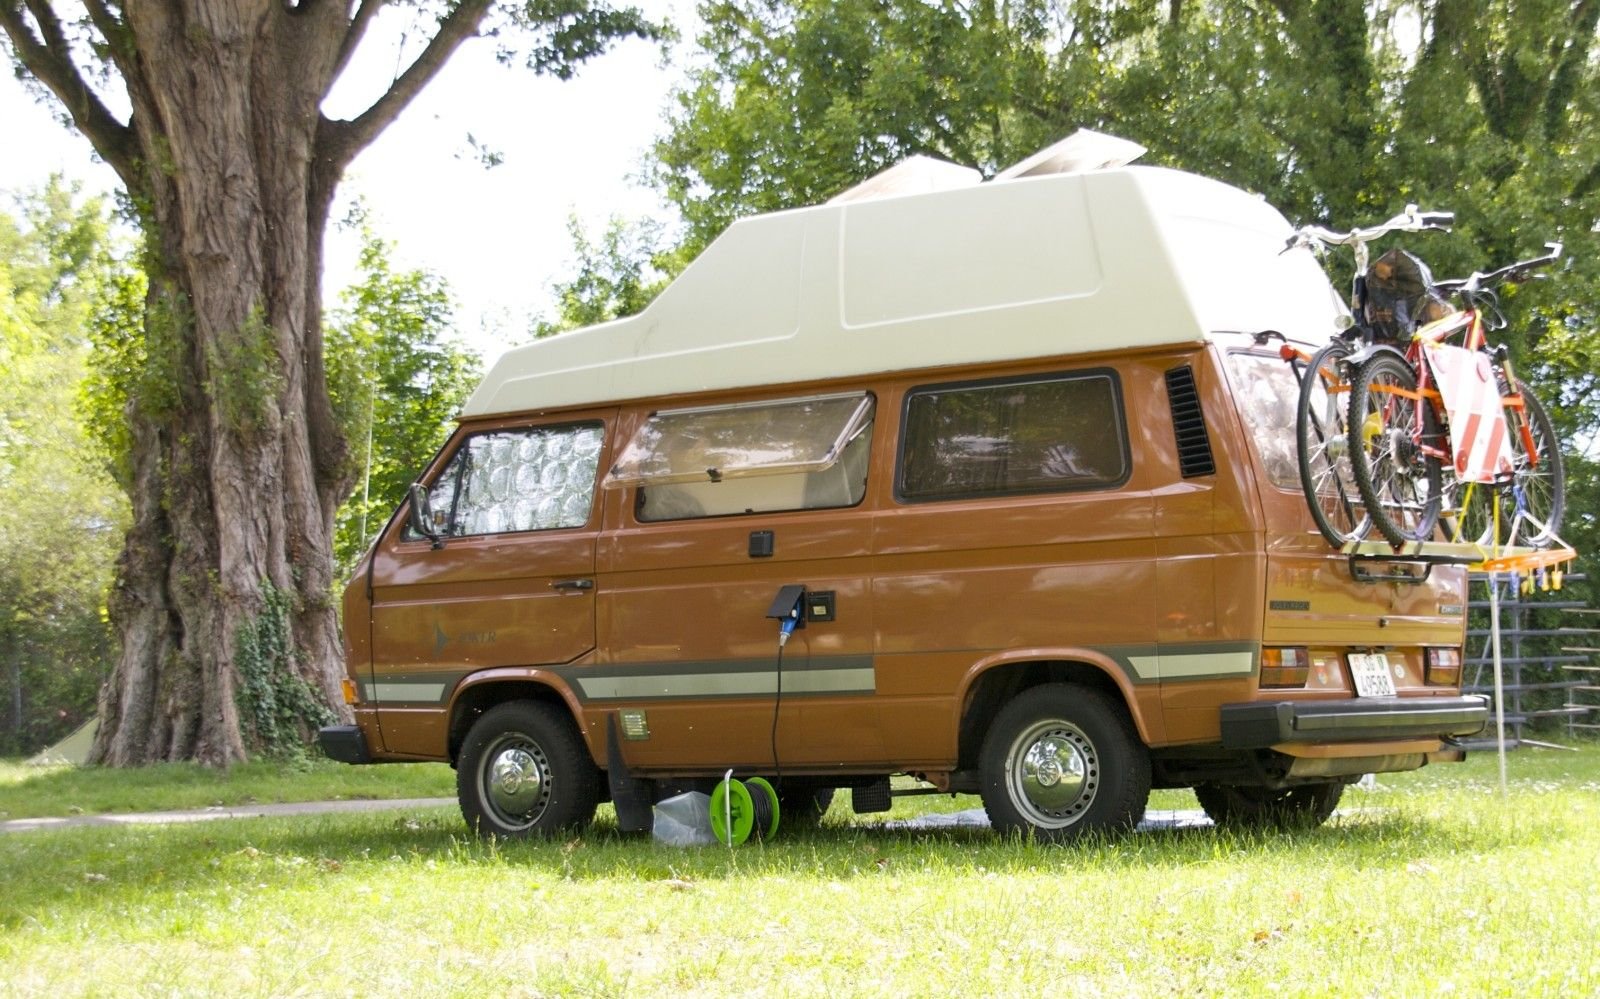 t3 vw joker westfalia campsite volkswagen bus campsite. Black Bedroom Furniture Sets. Home Design Ideas